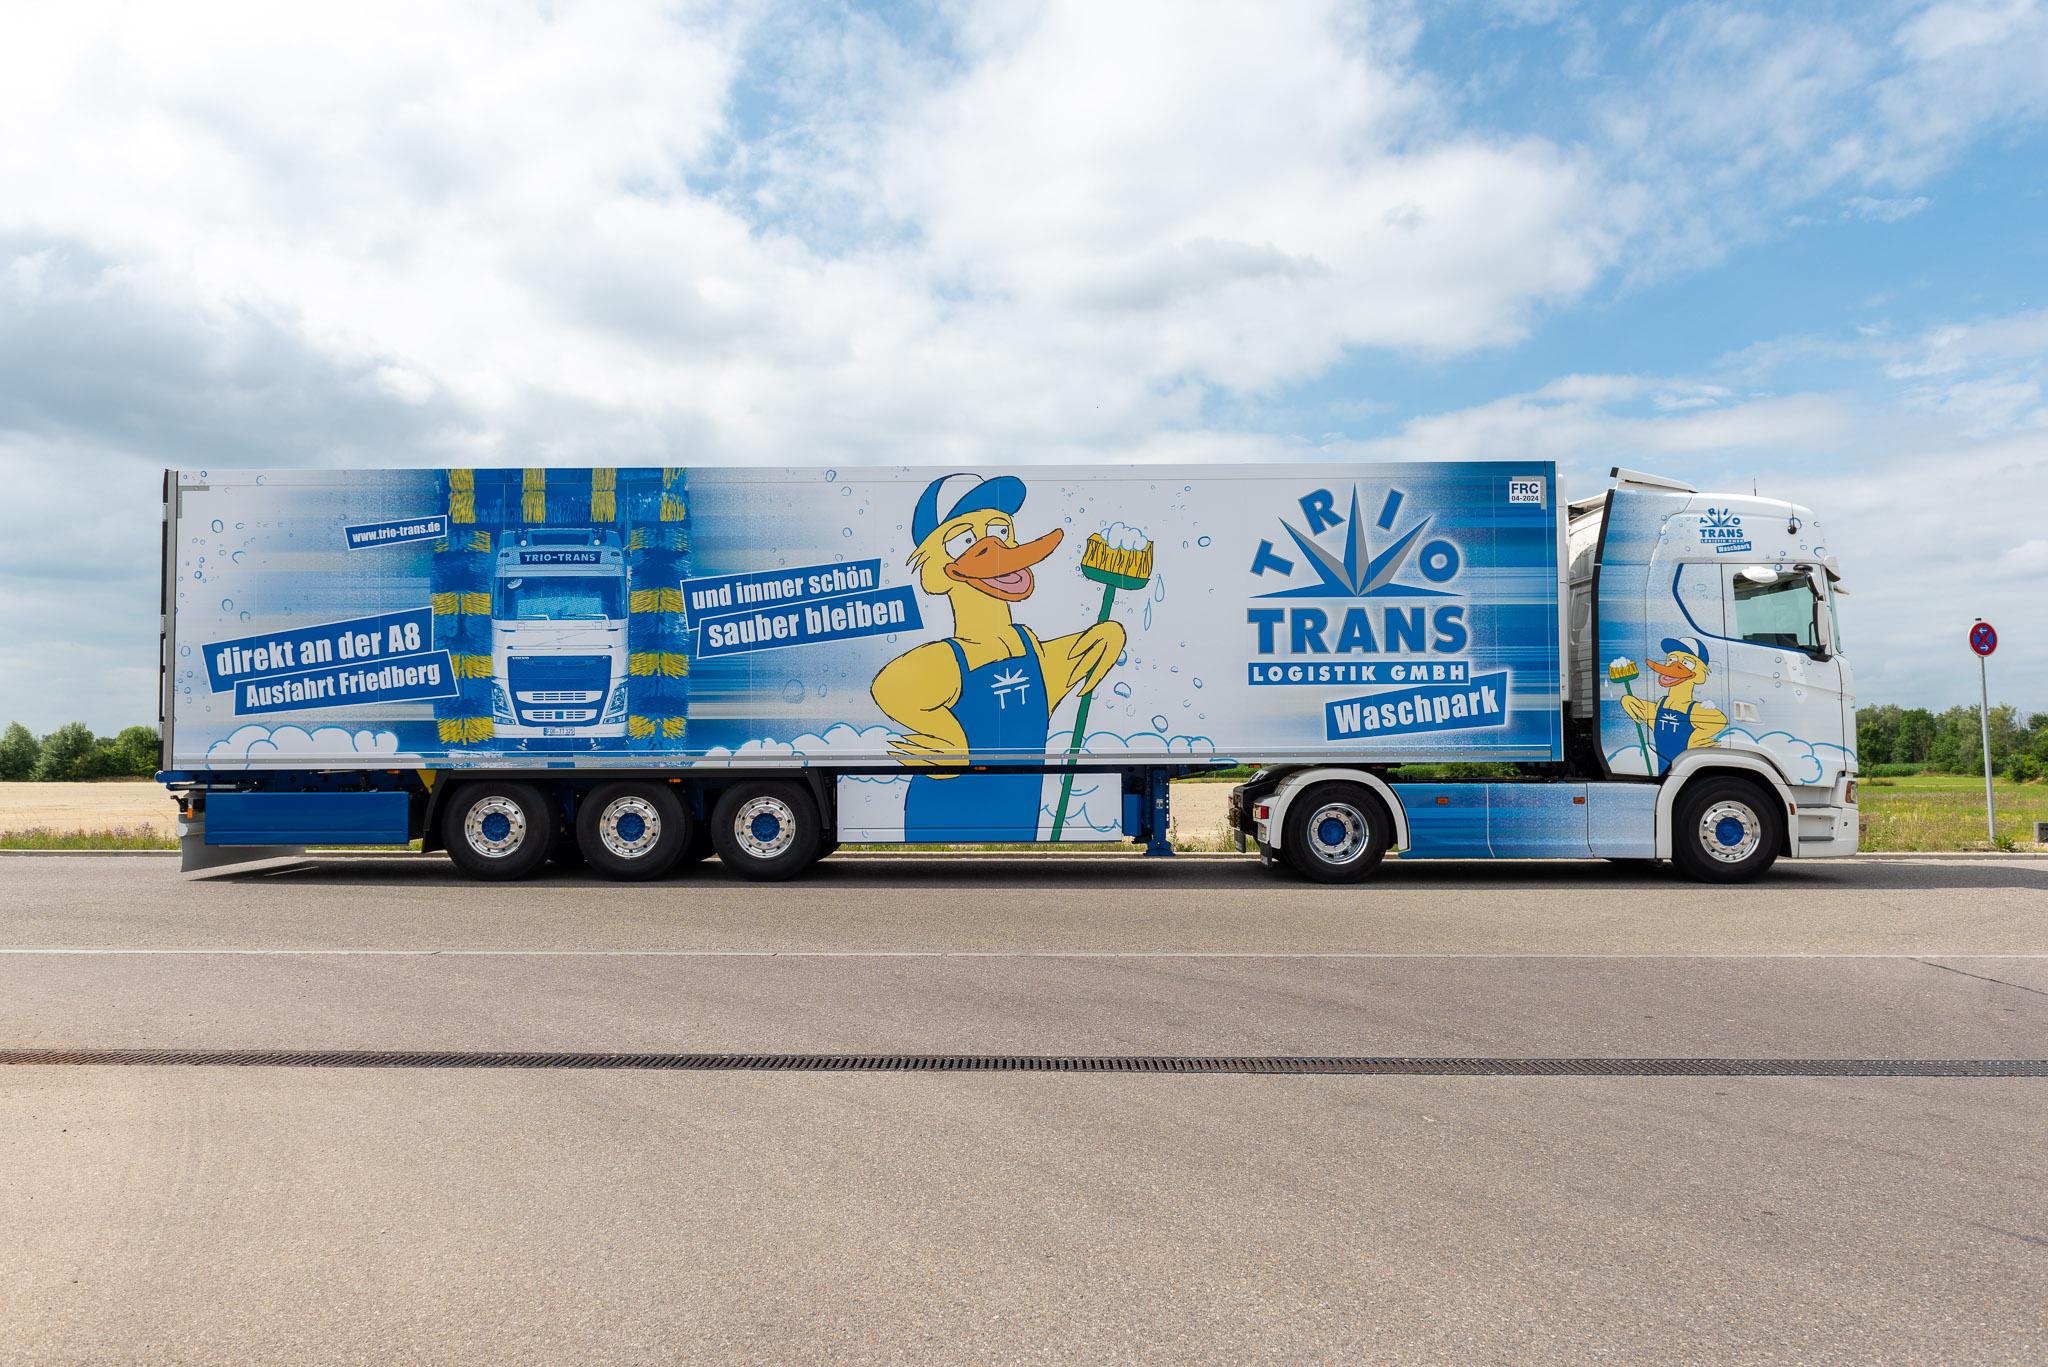 180624-Trio Trans Logistik Trucks-1627-2048.jpg